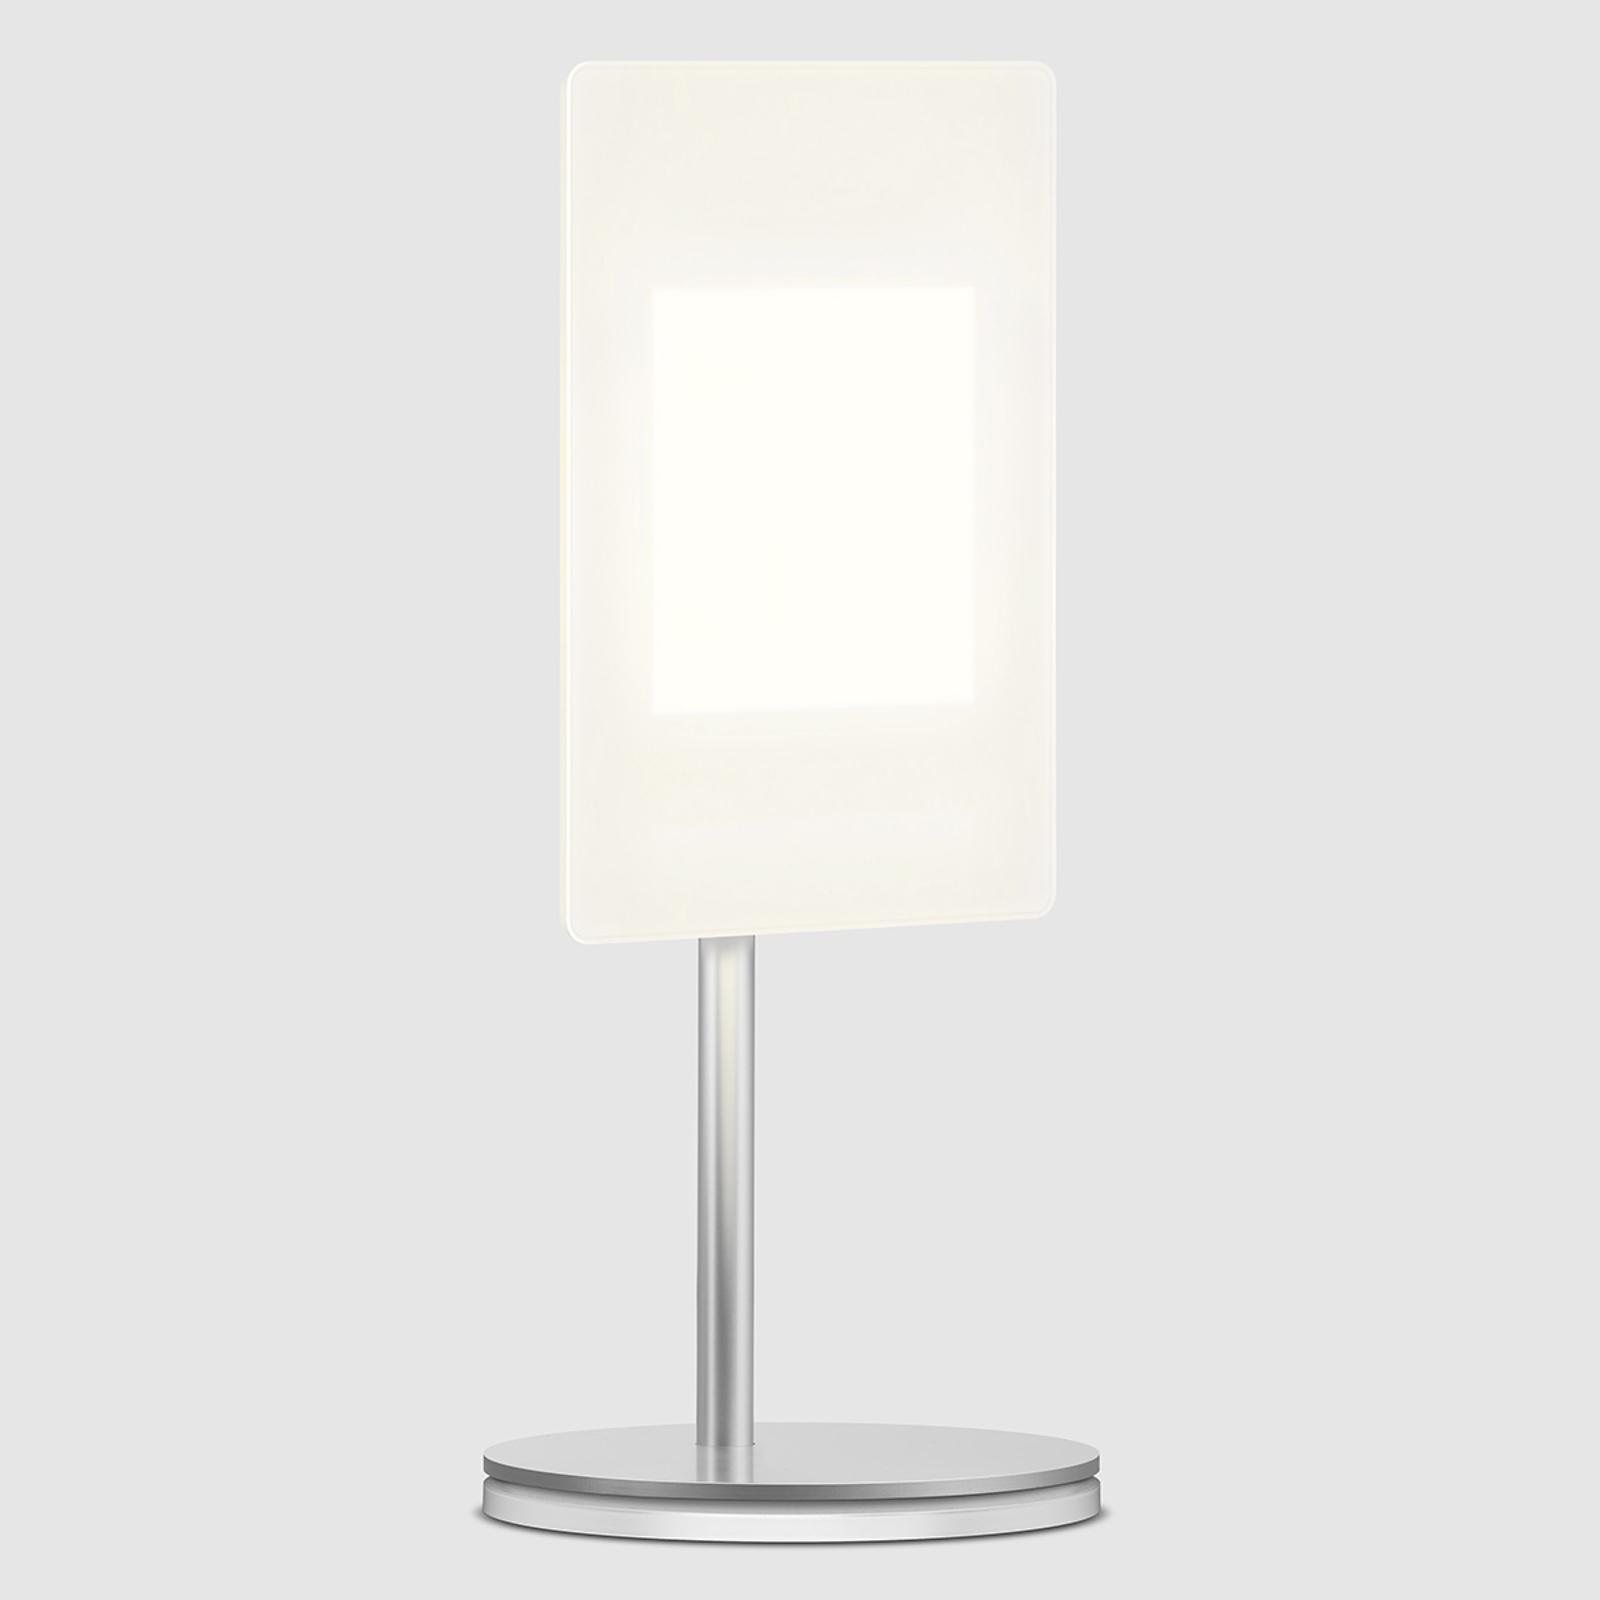 OLED tafellamp OMLED One t1 met OLEDs, wit